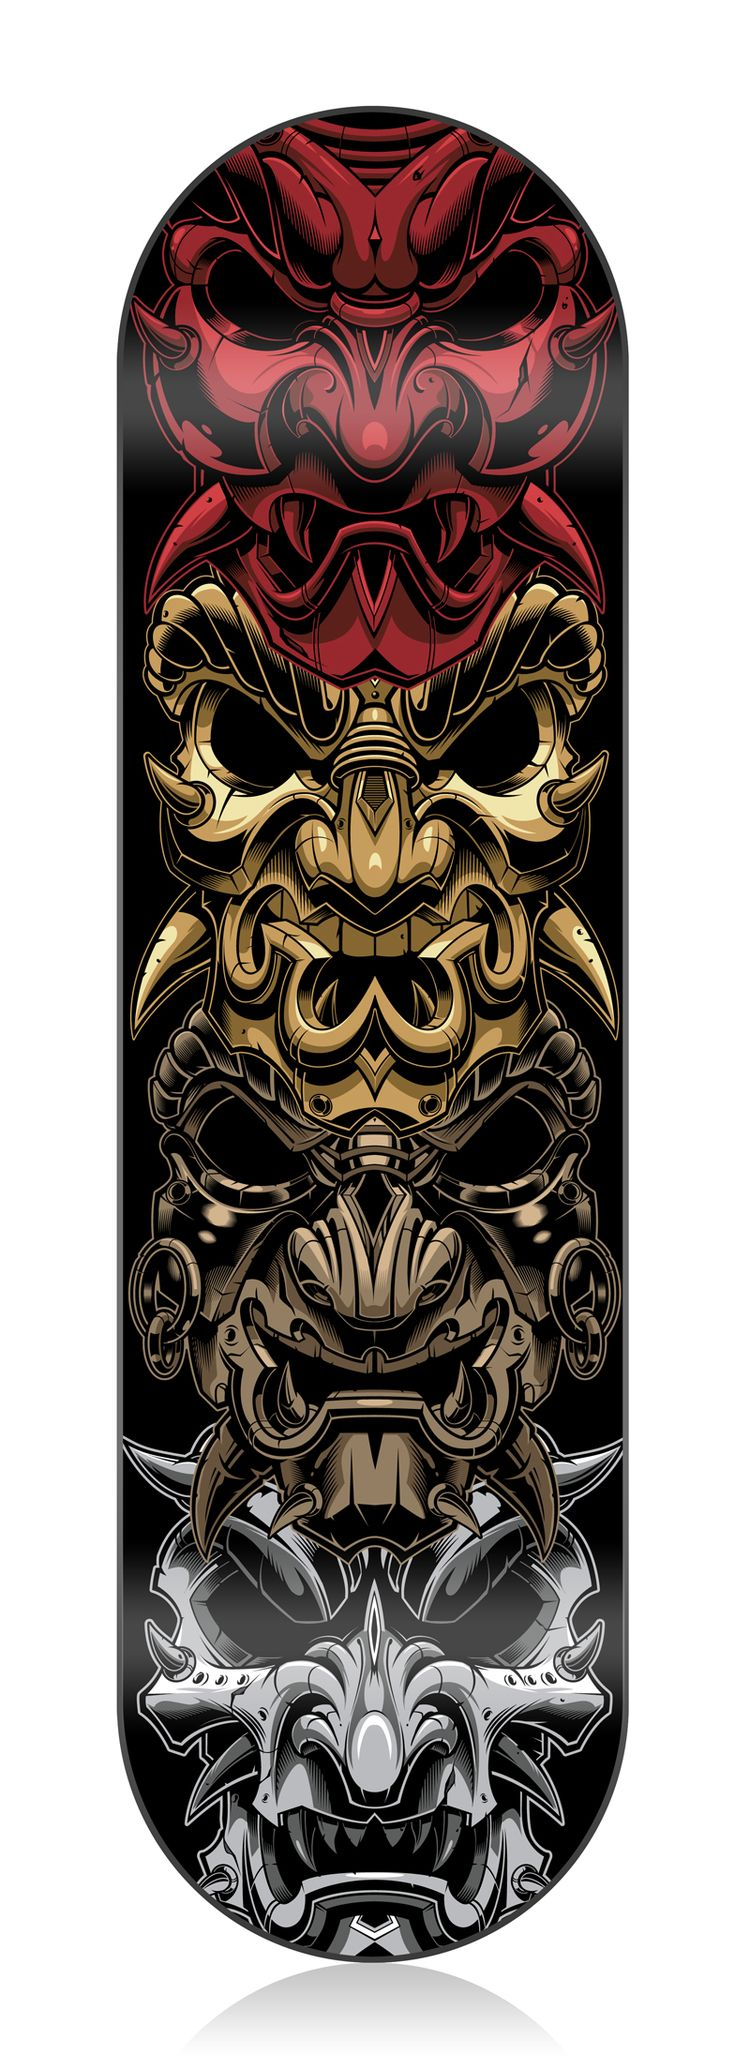 Skatedeck-samurai-vector-illustration.jpg                                                                                                                                                     Más